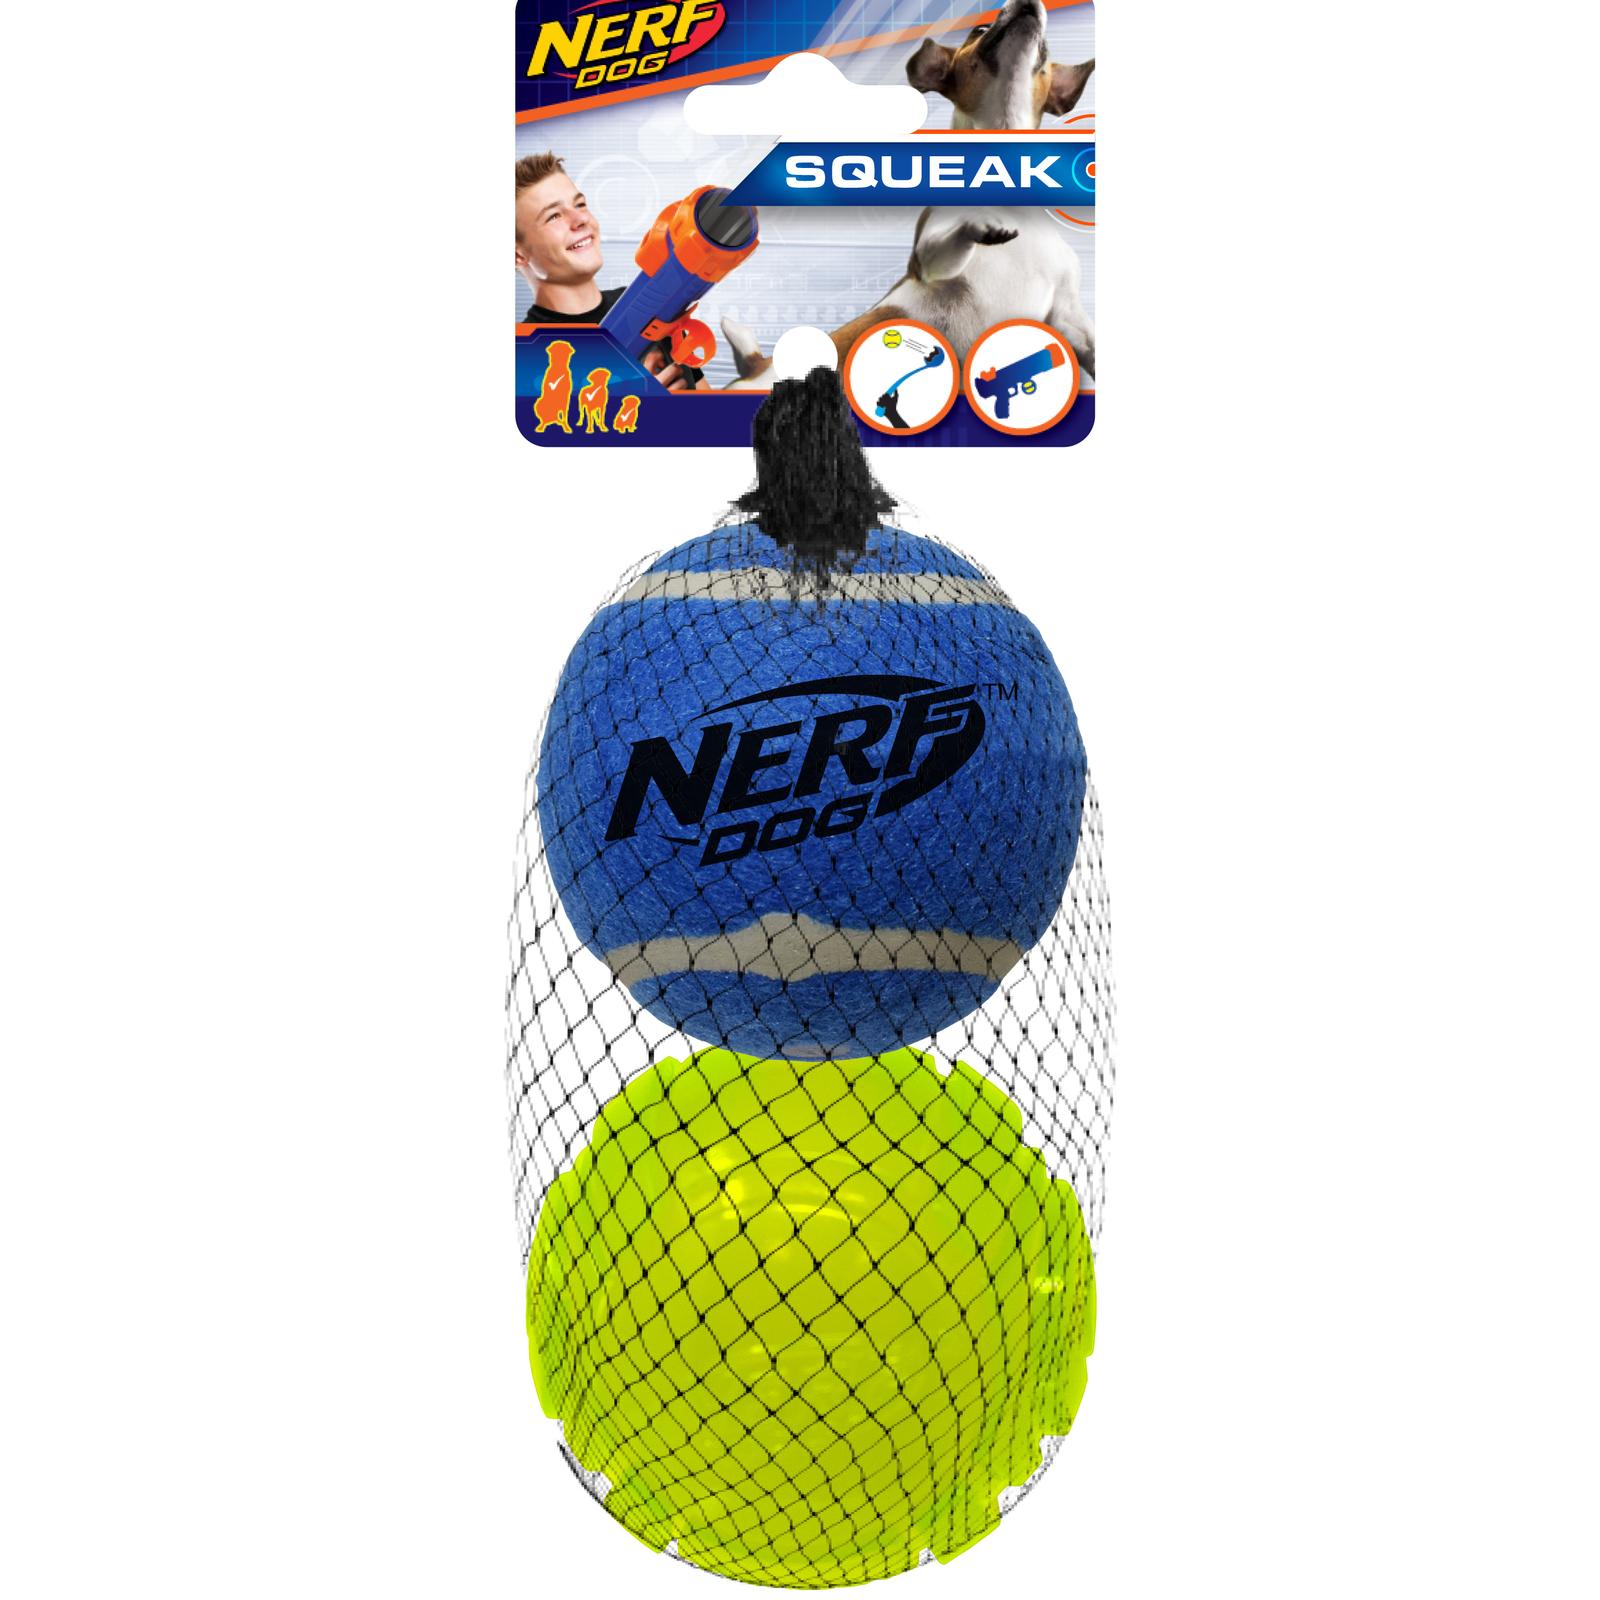 Nerf Dog Sonic Ball & Squeak Tennis Ball 2pk image